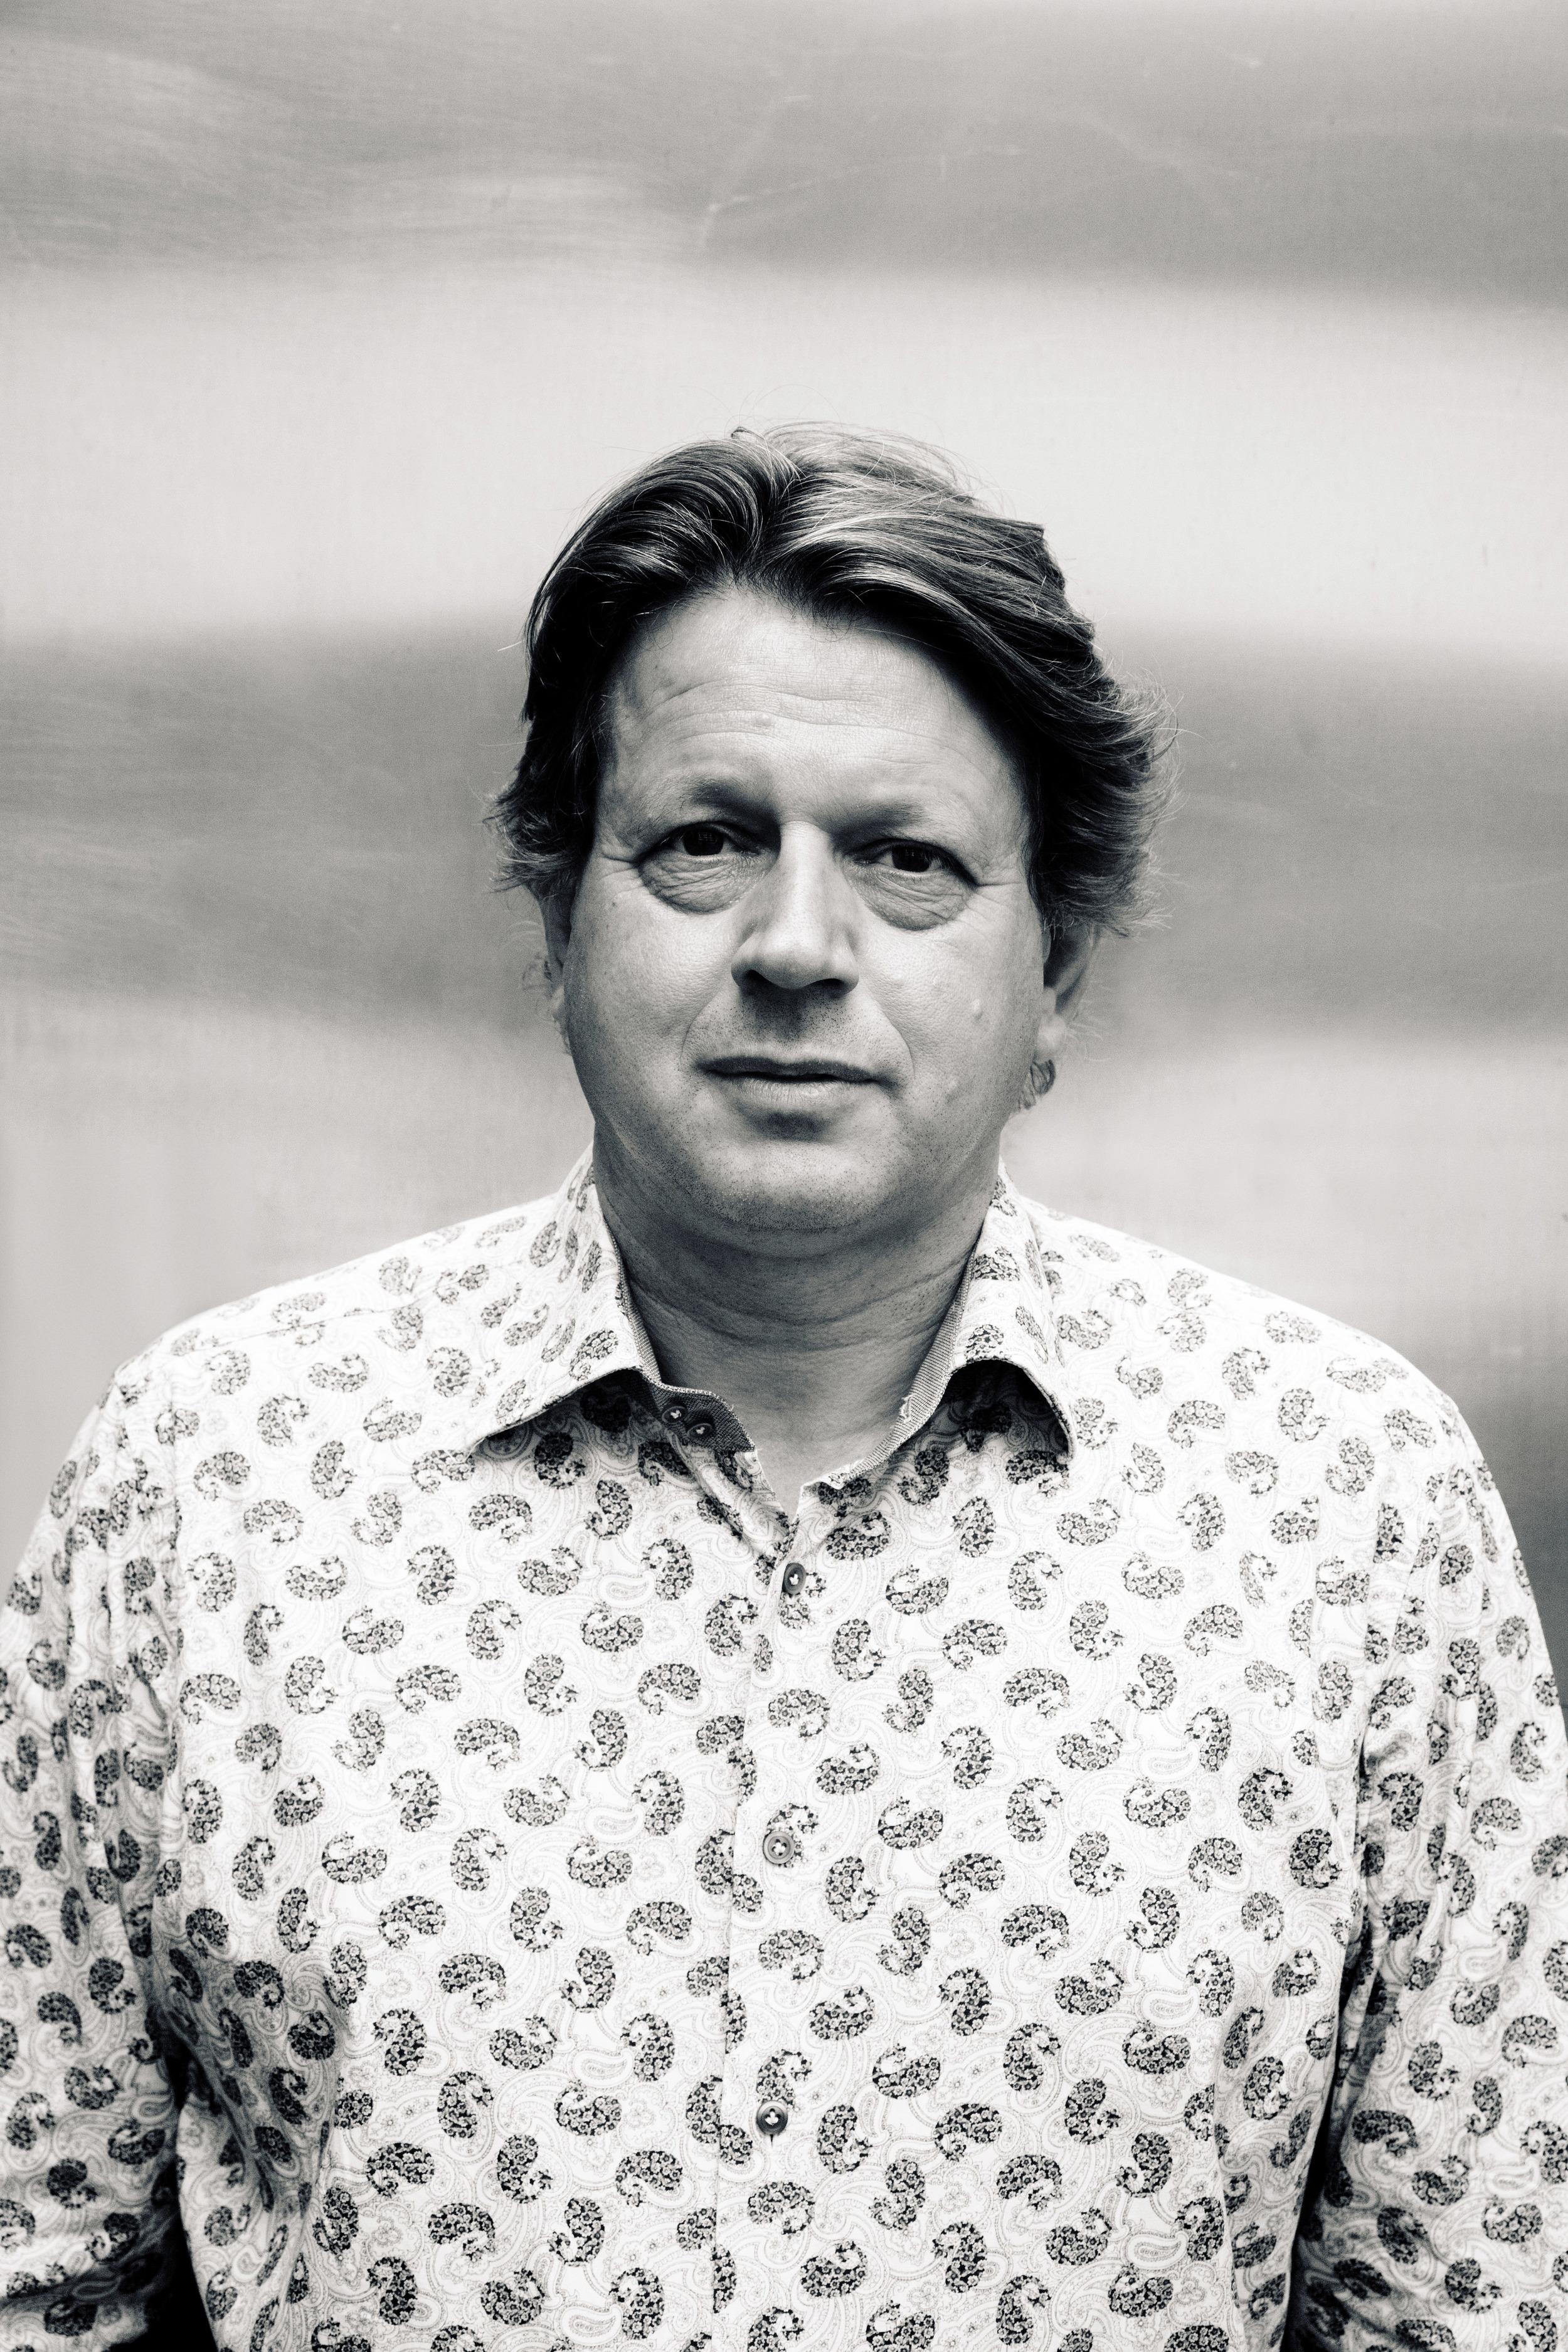 Peter F Hamilton